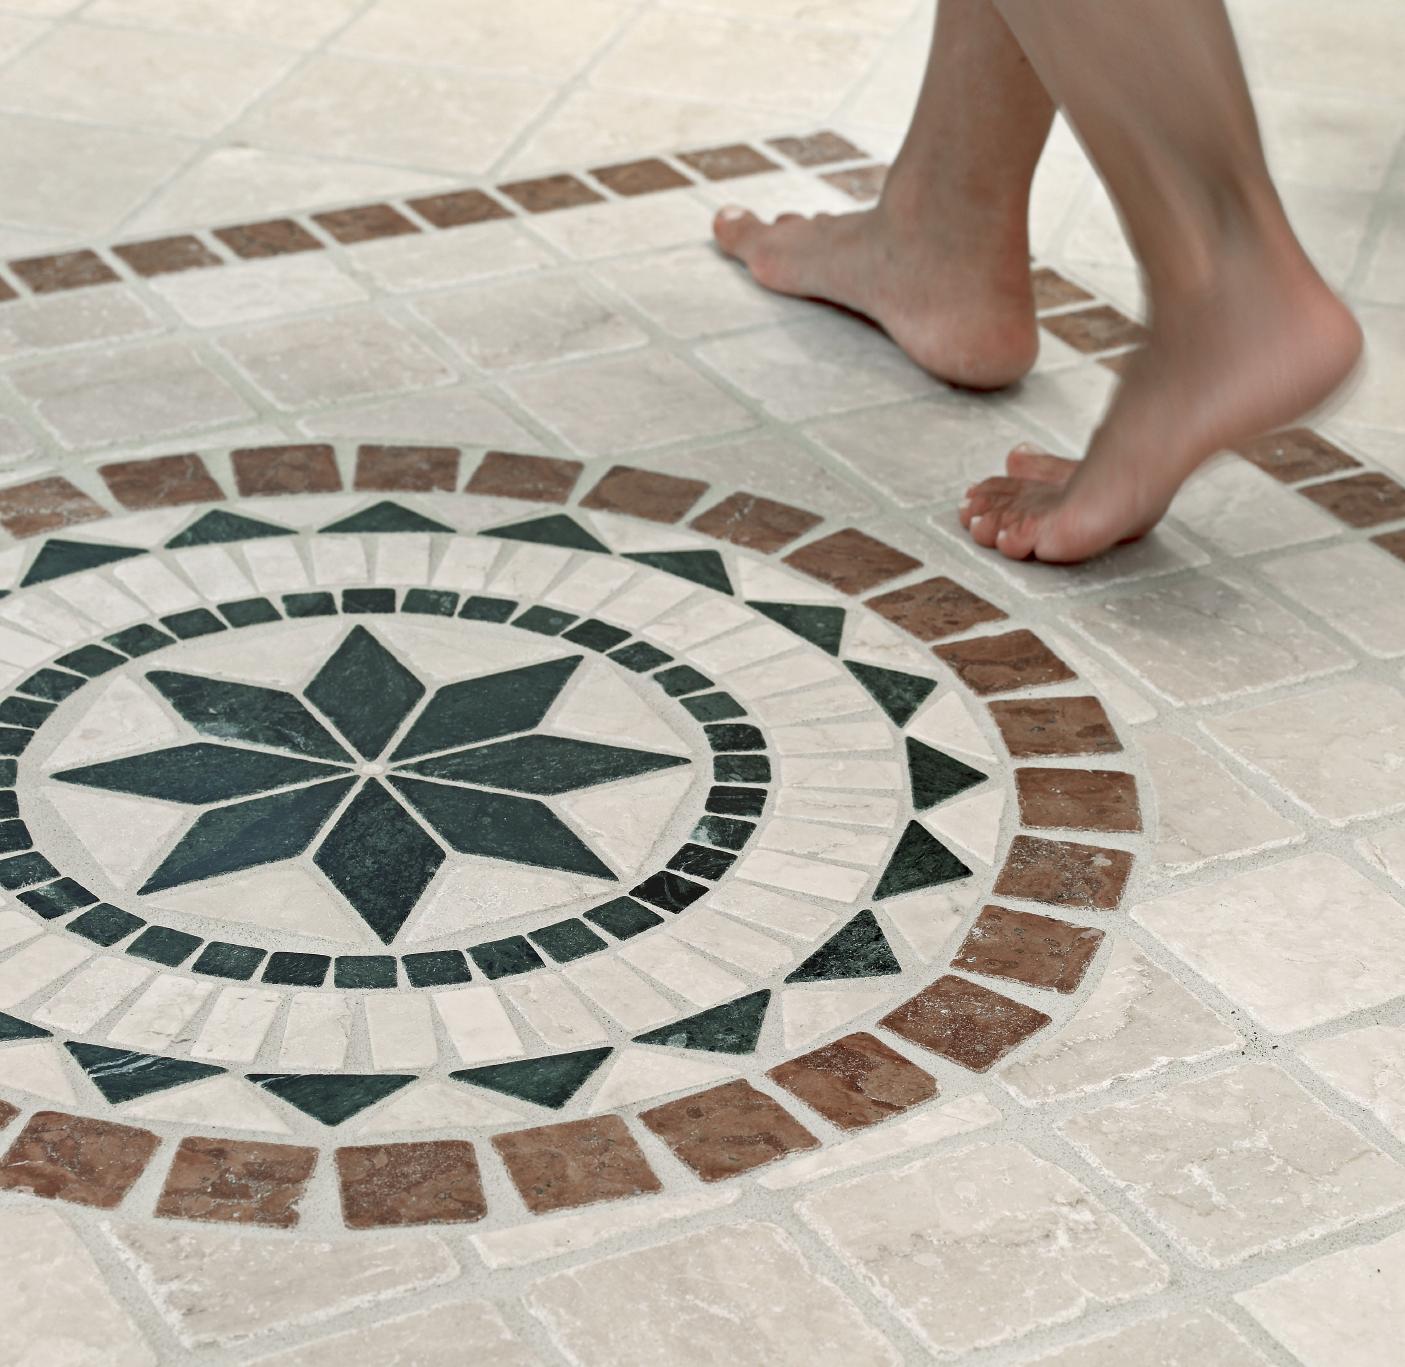 Tile & Stone Importer, Retailer & Wholesaler